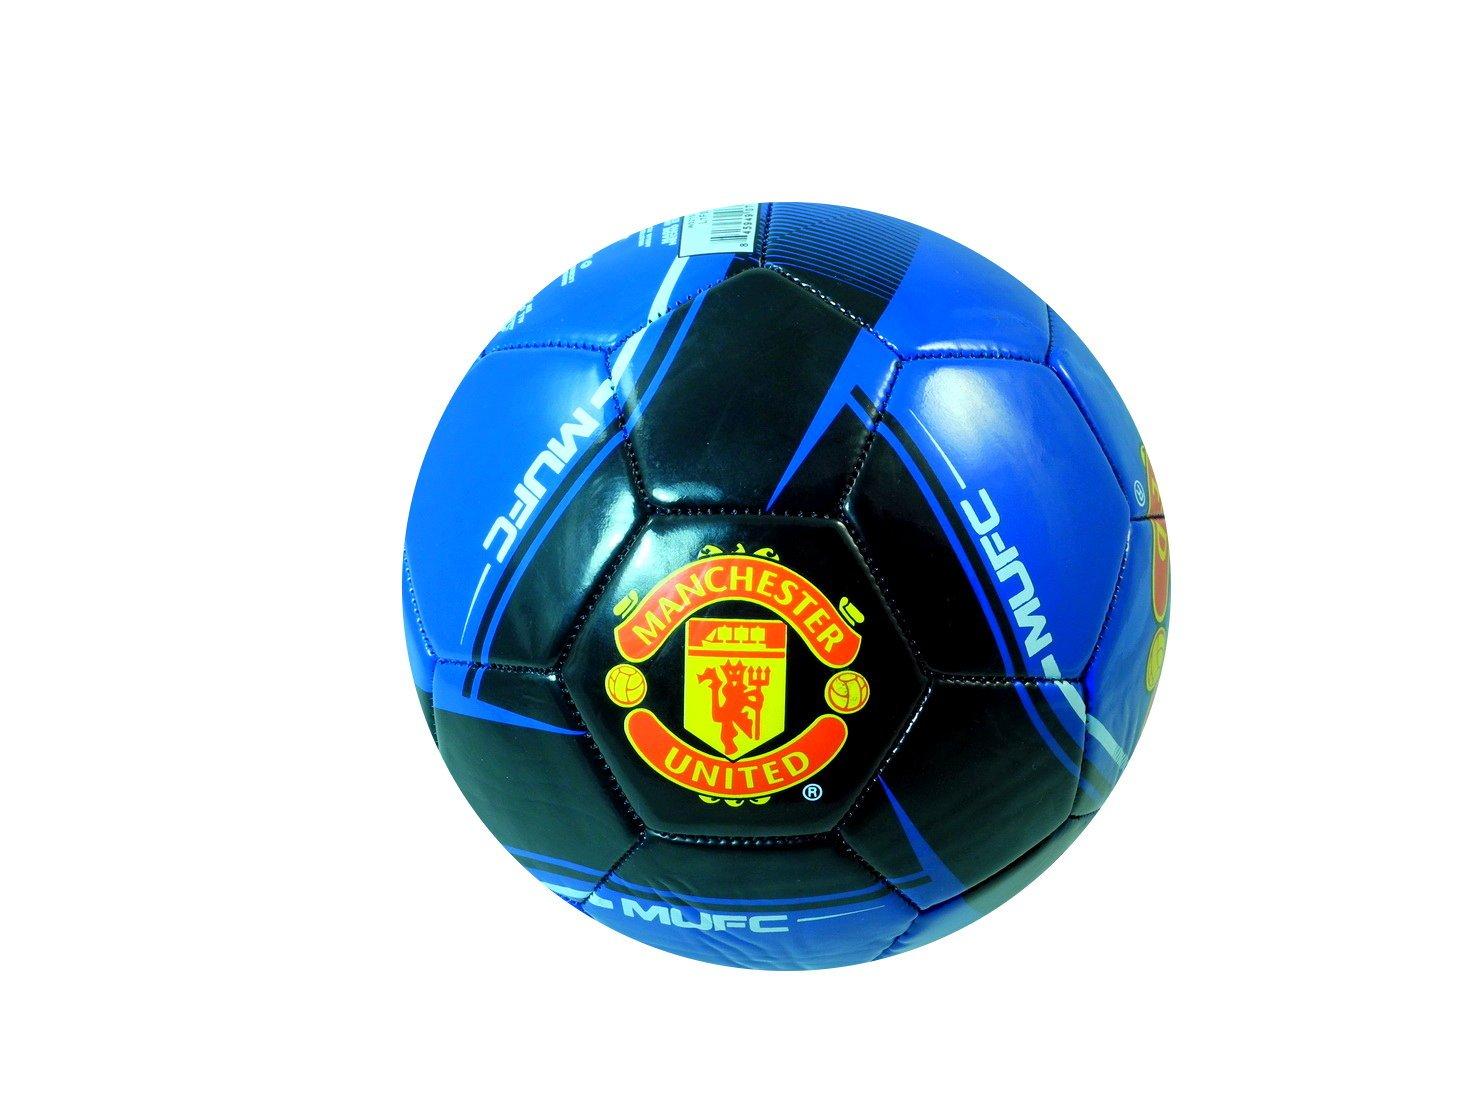 Manchester Unitedサッカーボールサイズ5 Authentic officialFutbol B01KM13940